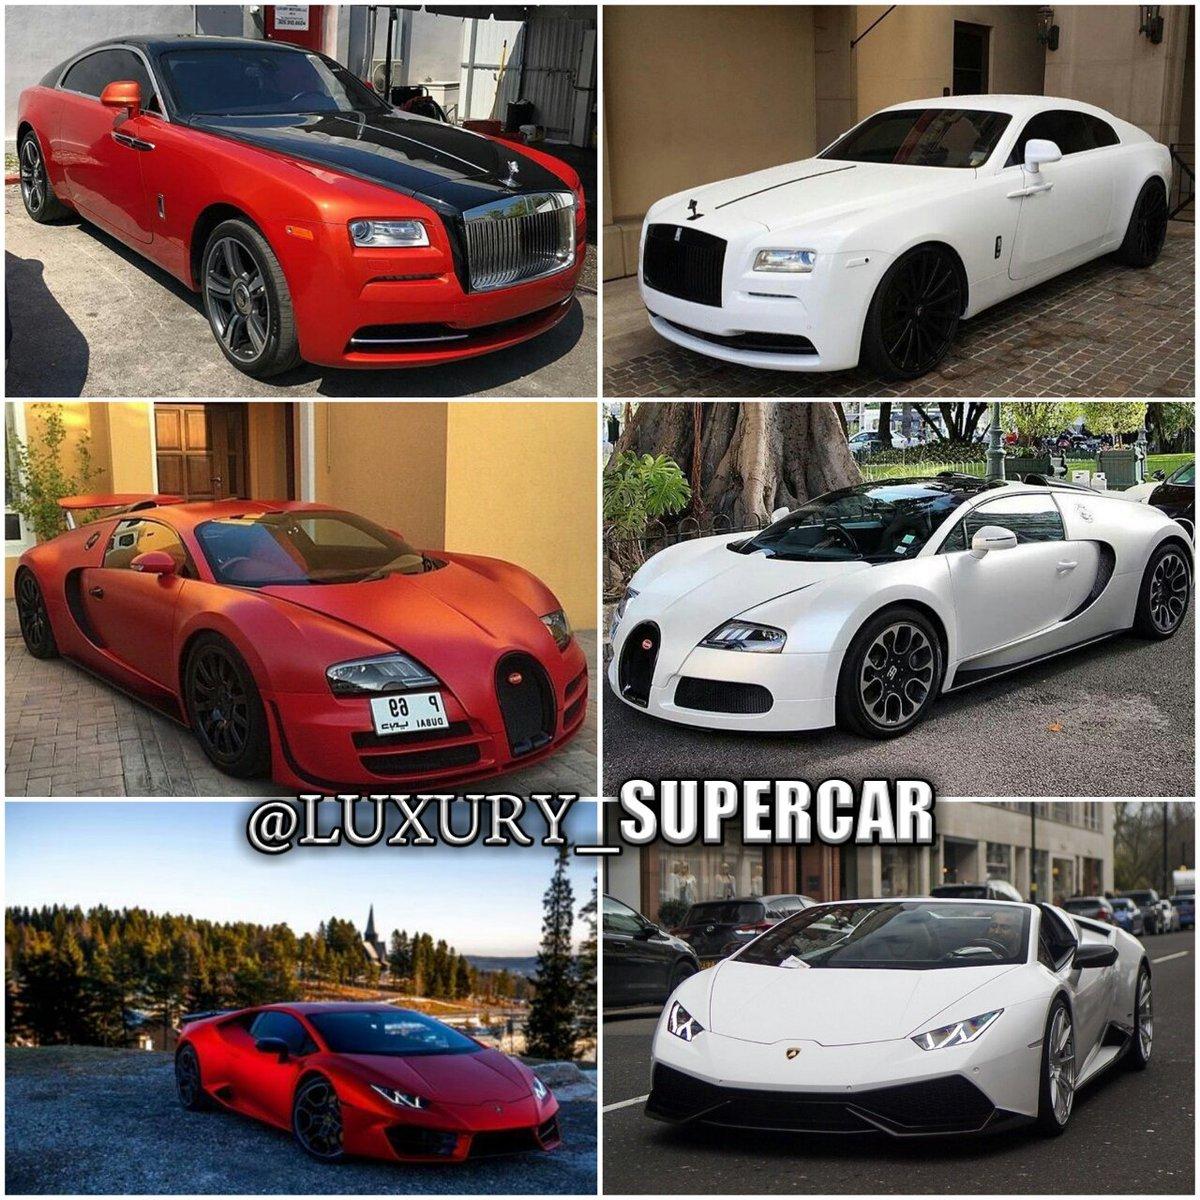 Luxury Super Car On Twitter Red Or White Rollsroyce Bugatti